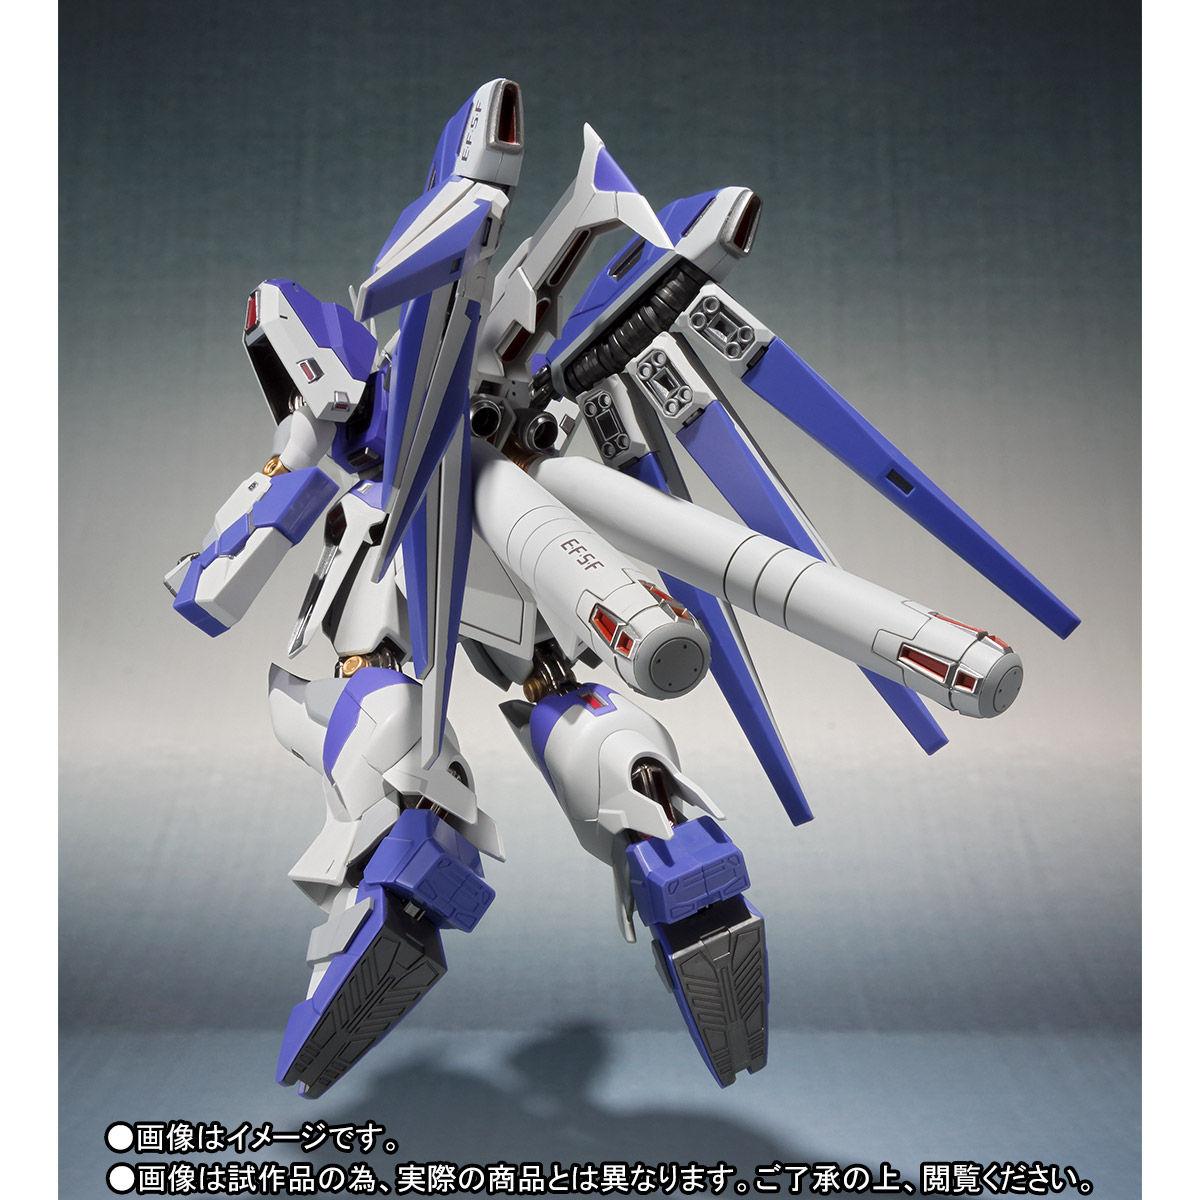 METAL ROBOT魂『Hi-νガンダム』逆襲のシャア 可動フィギュア-003